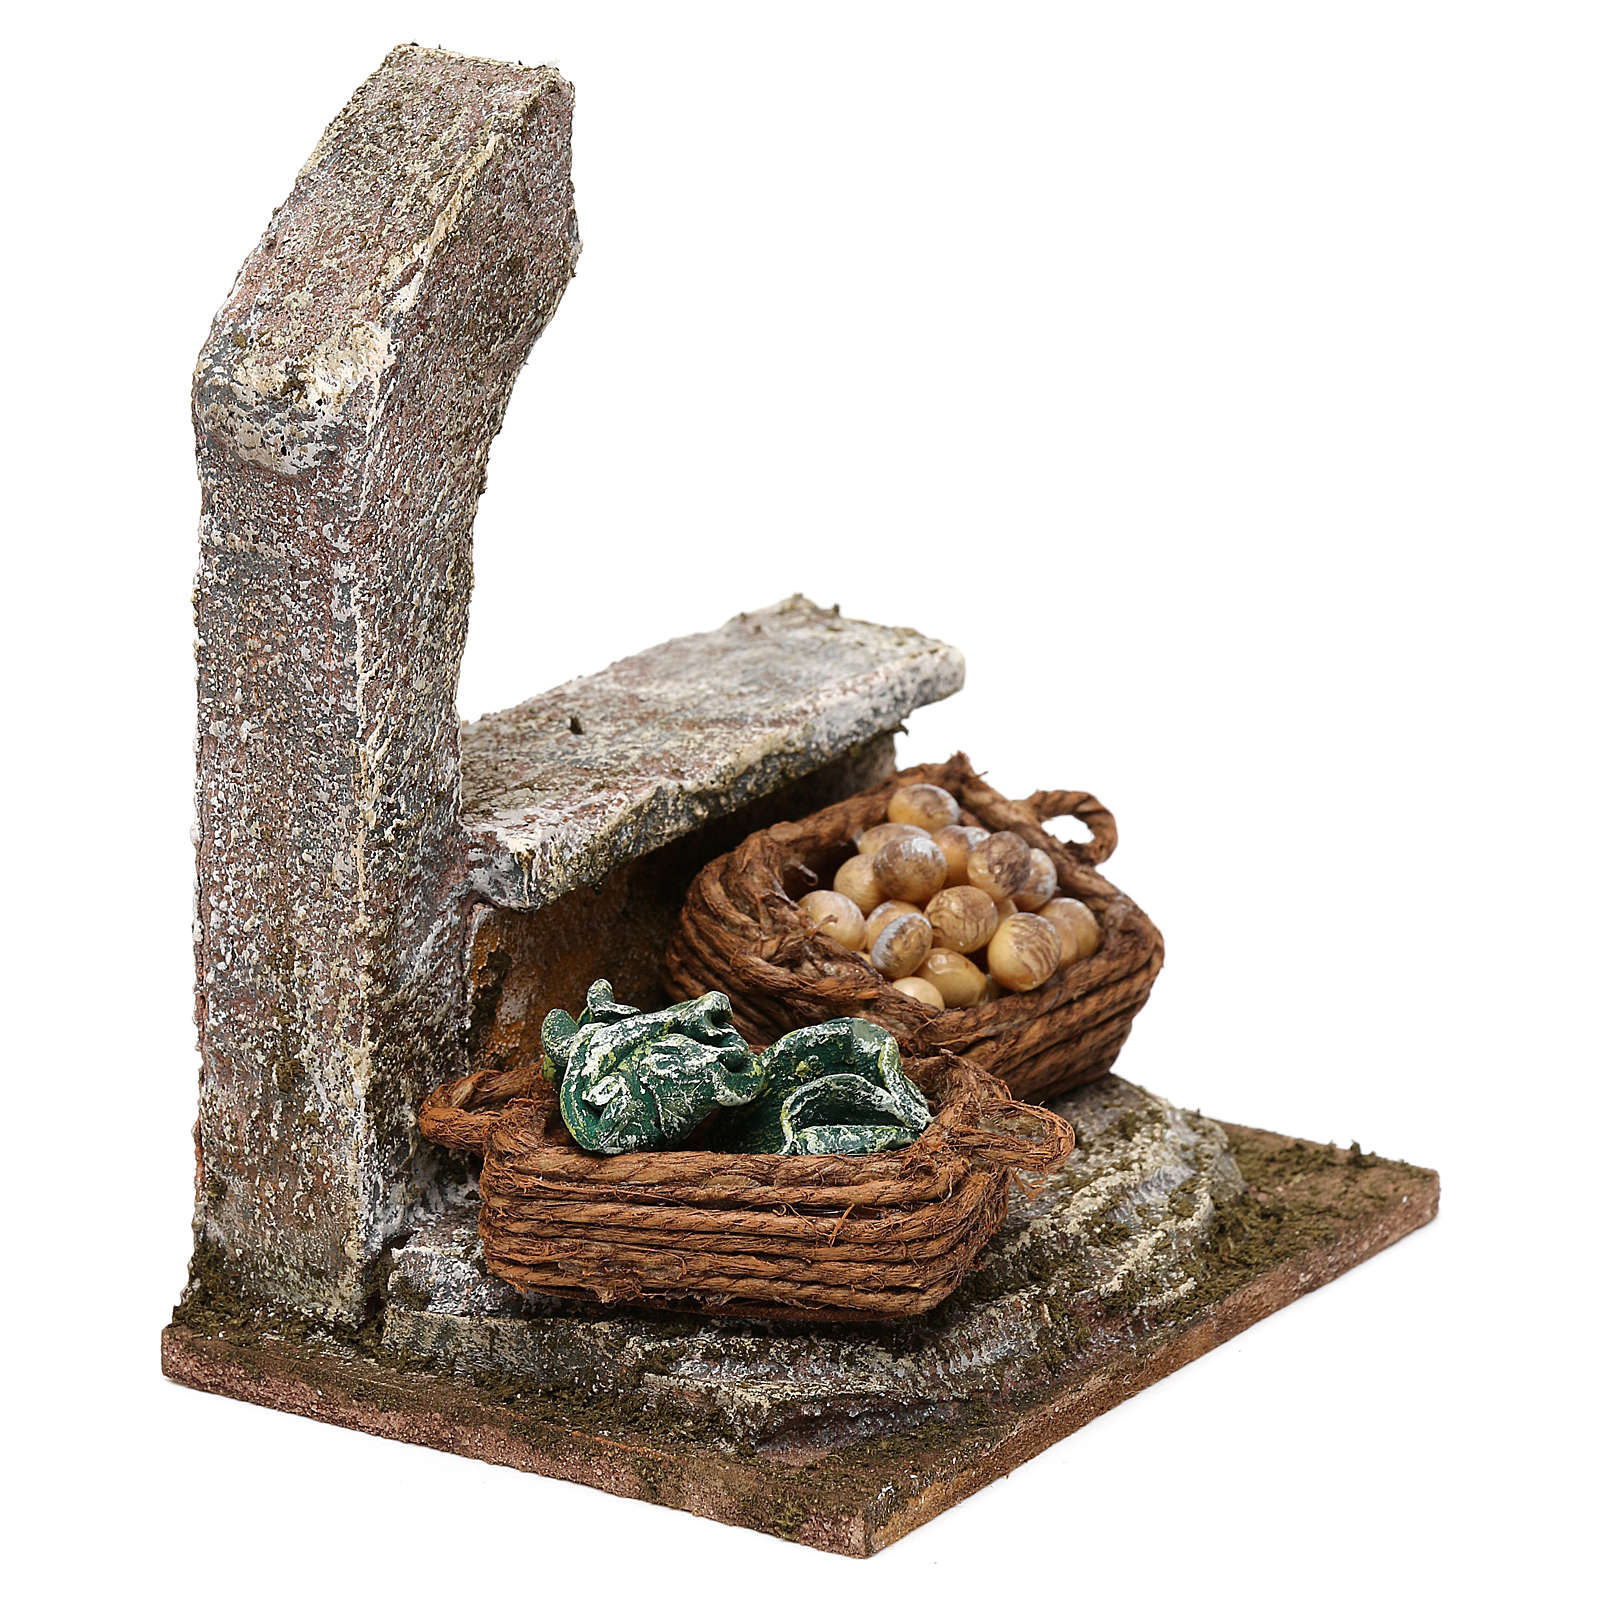 Arcata con ceste verdura presepi 10 cm 10x10x10 cm 4